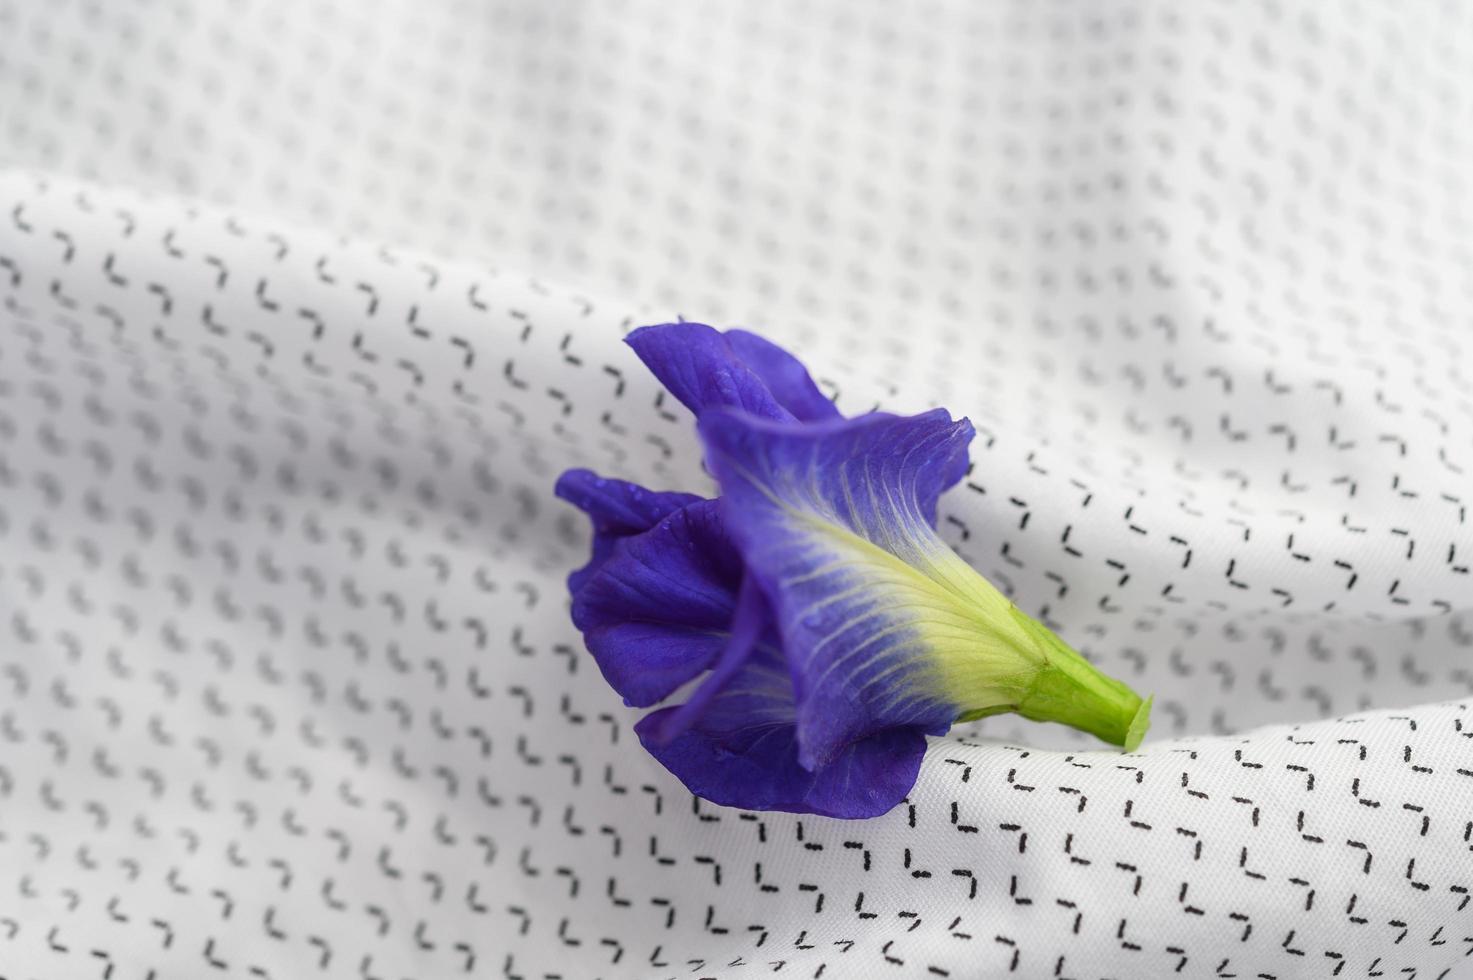 flor de ervilha borboleta azul foto